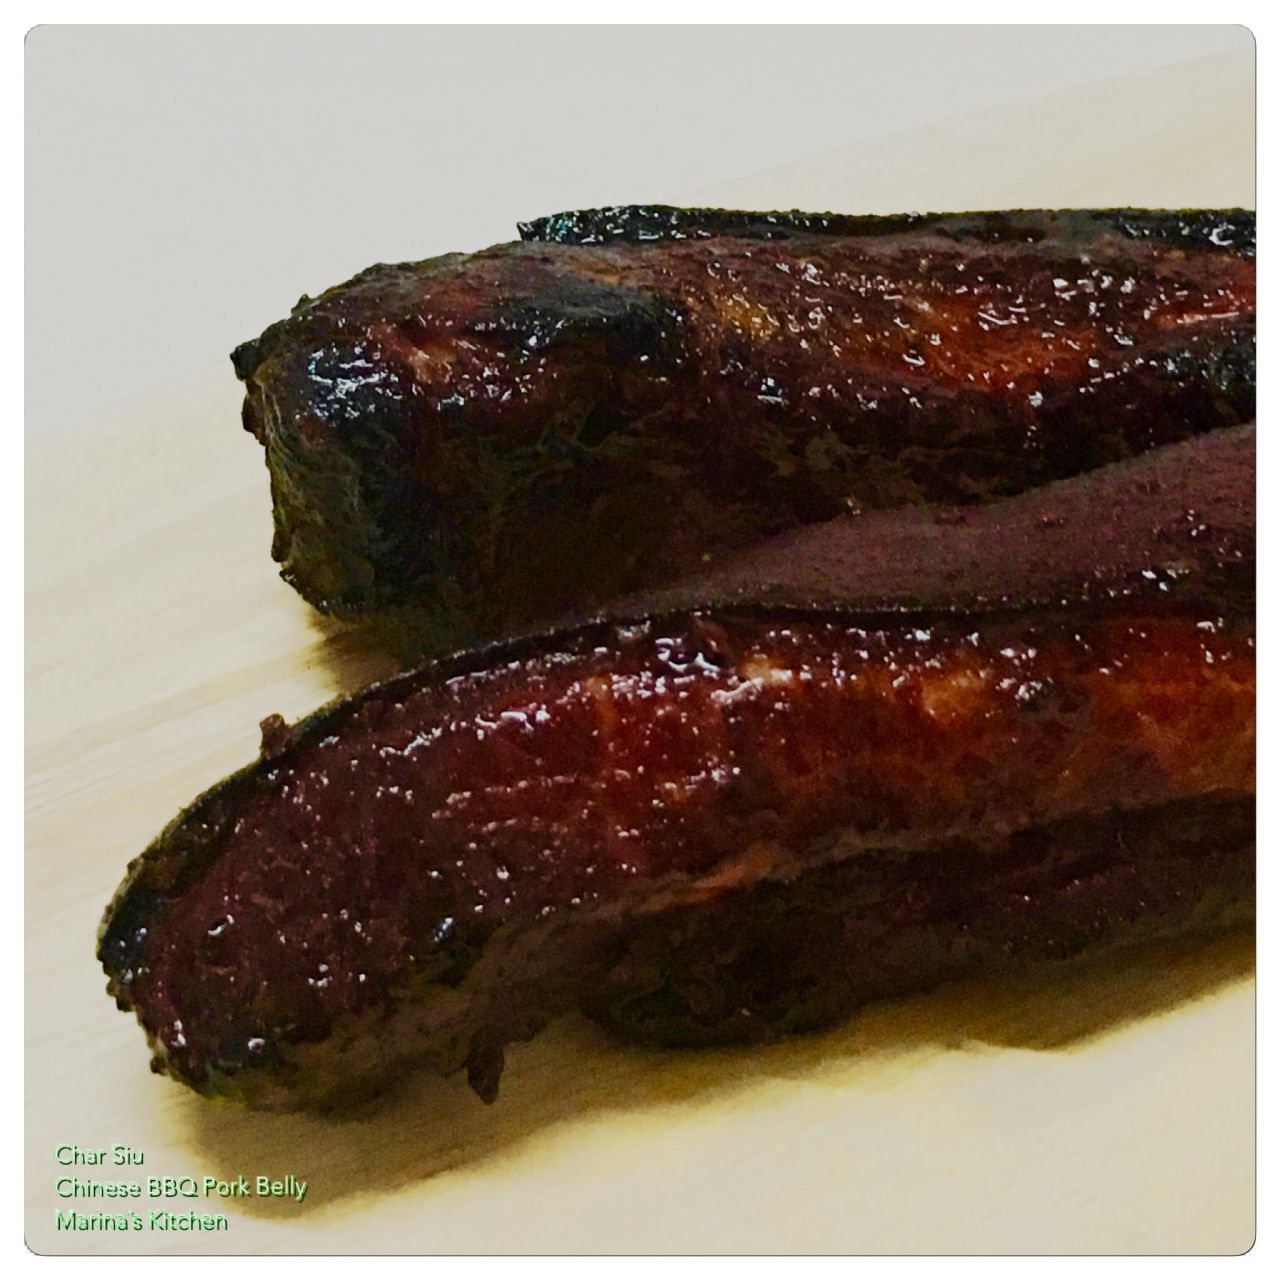 Char Siu (Chinese BBQ Pork Belly) | Marina's Kitchen